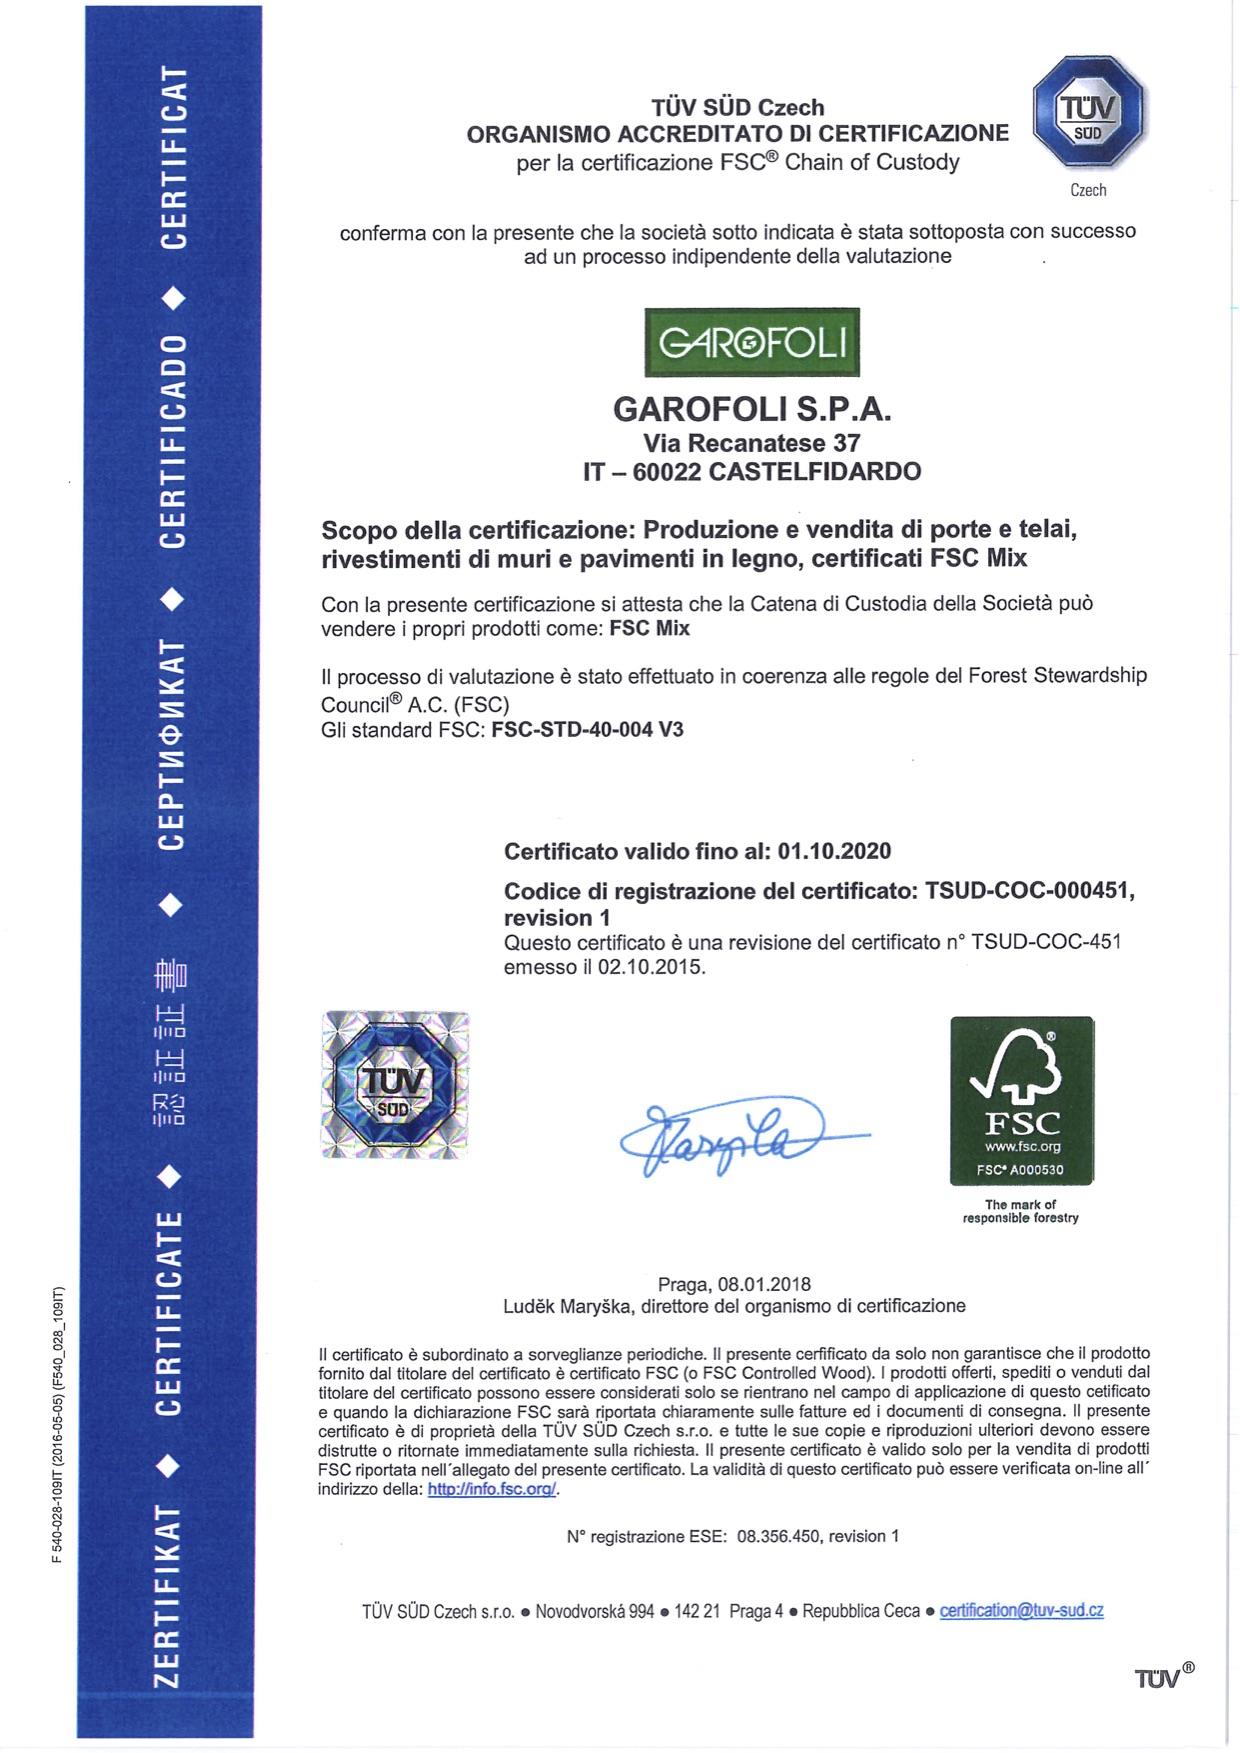 Garofoli certificato fsc - Garofoli